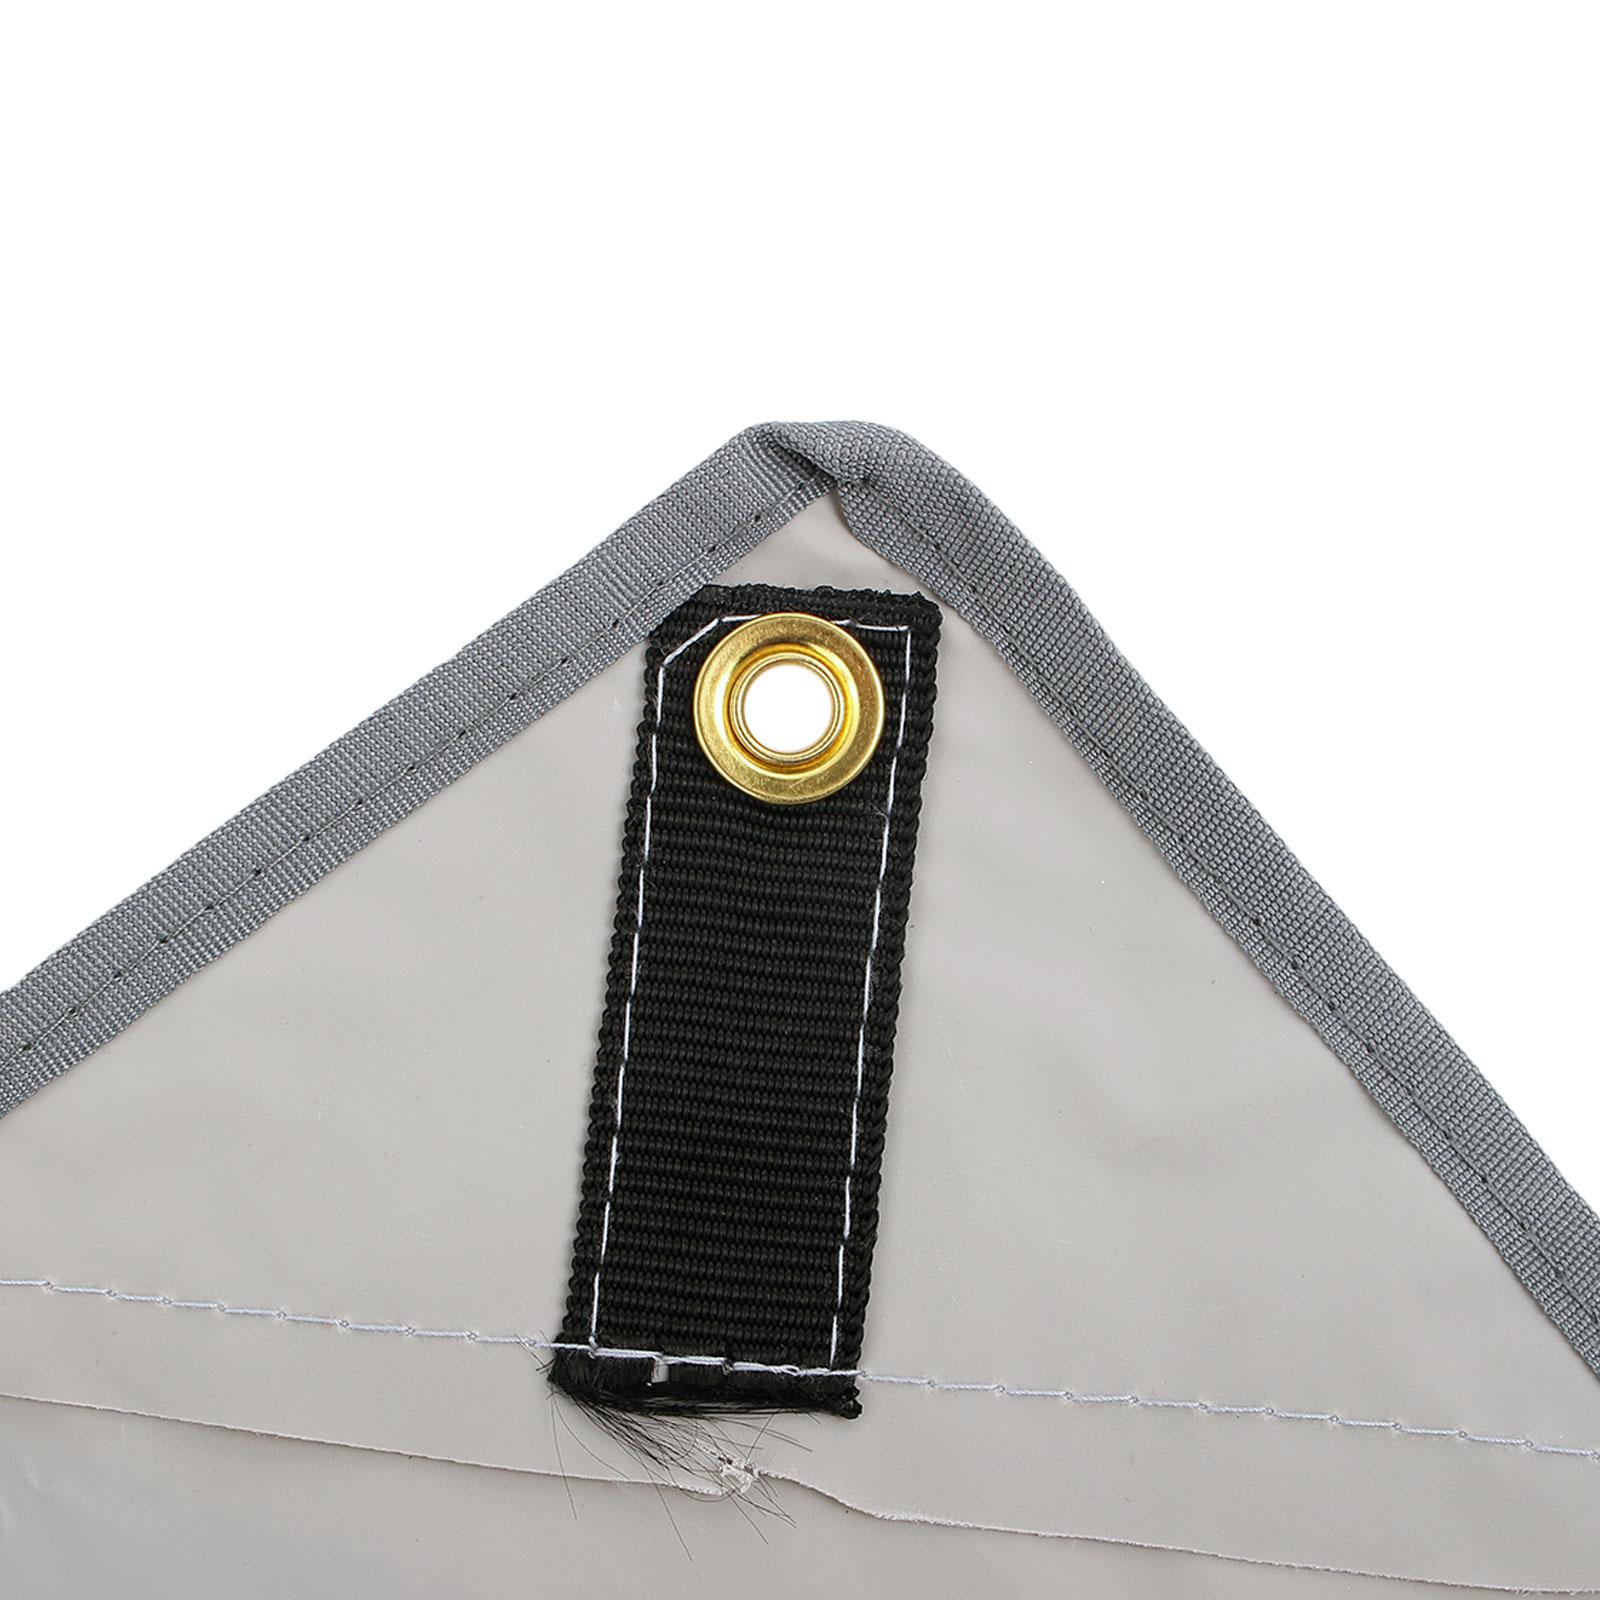 sonnensegel sunny 400 f r keder 7 mm 400x240 cm inkl stangen heringe leinen. Black Bedroom Furniture Sets. Home Design Ideas